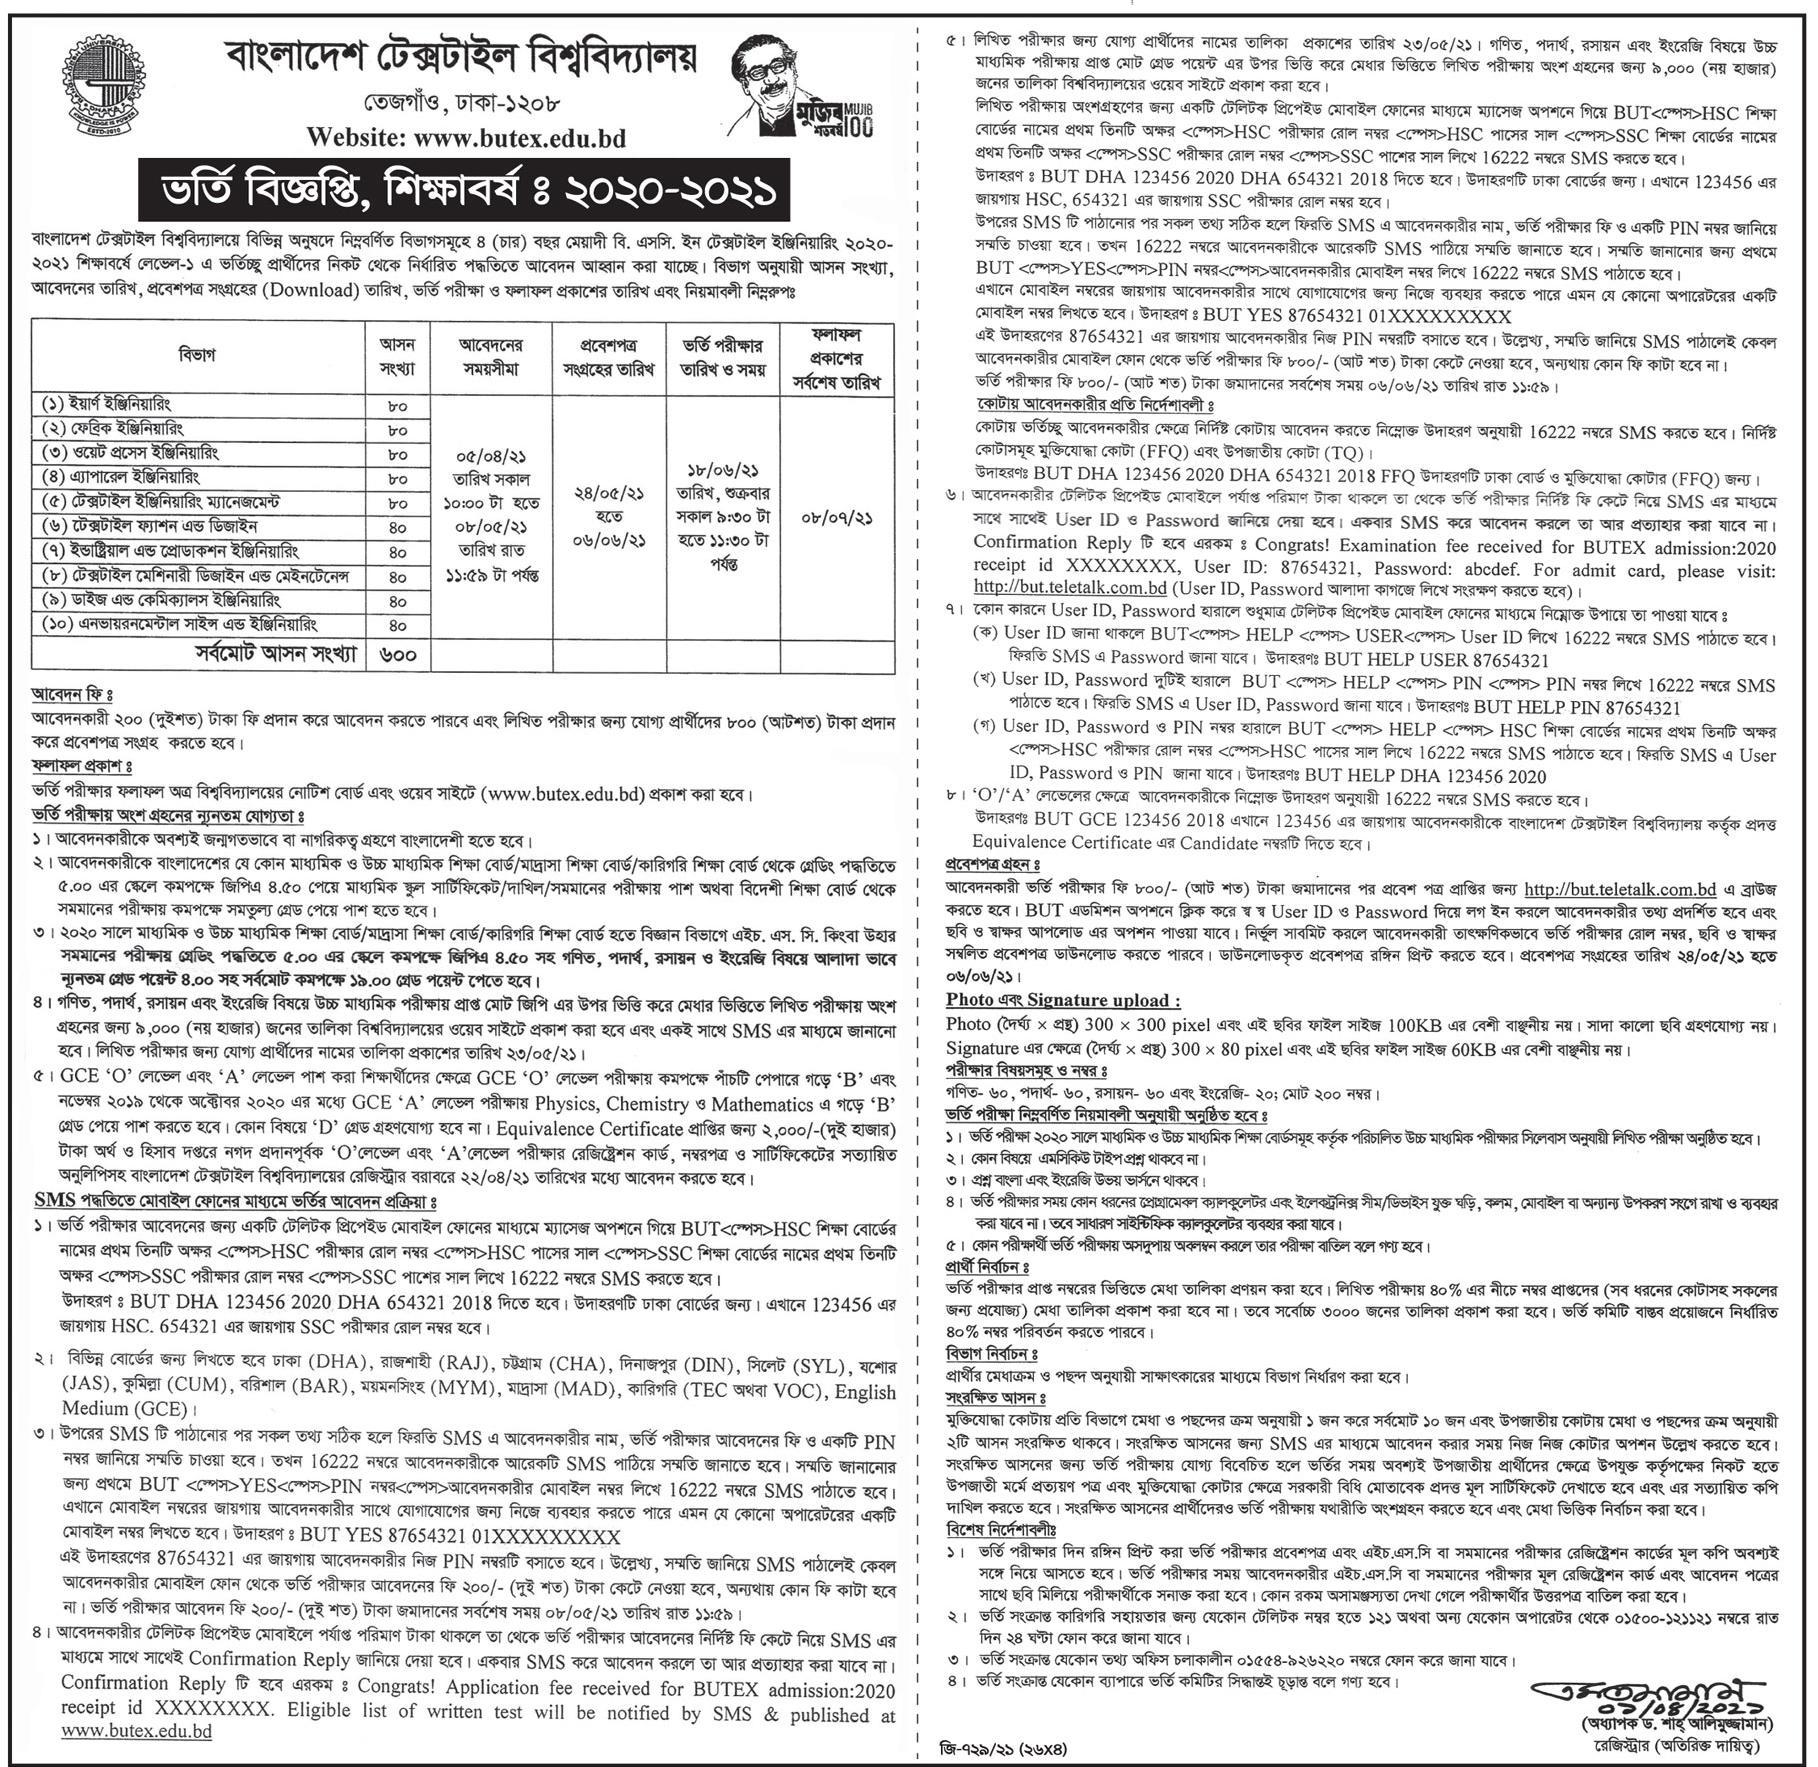 Bangladesh Textiles University Admission Circular 2020-2021